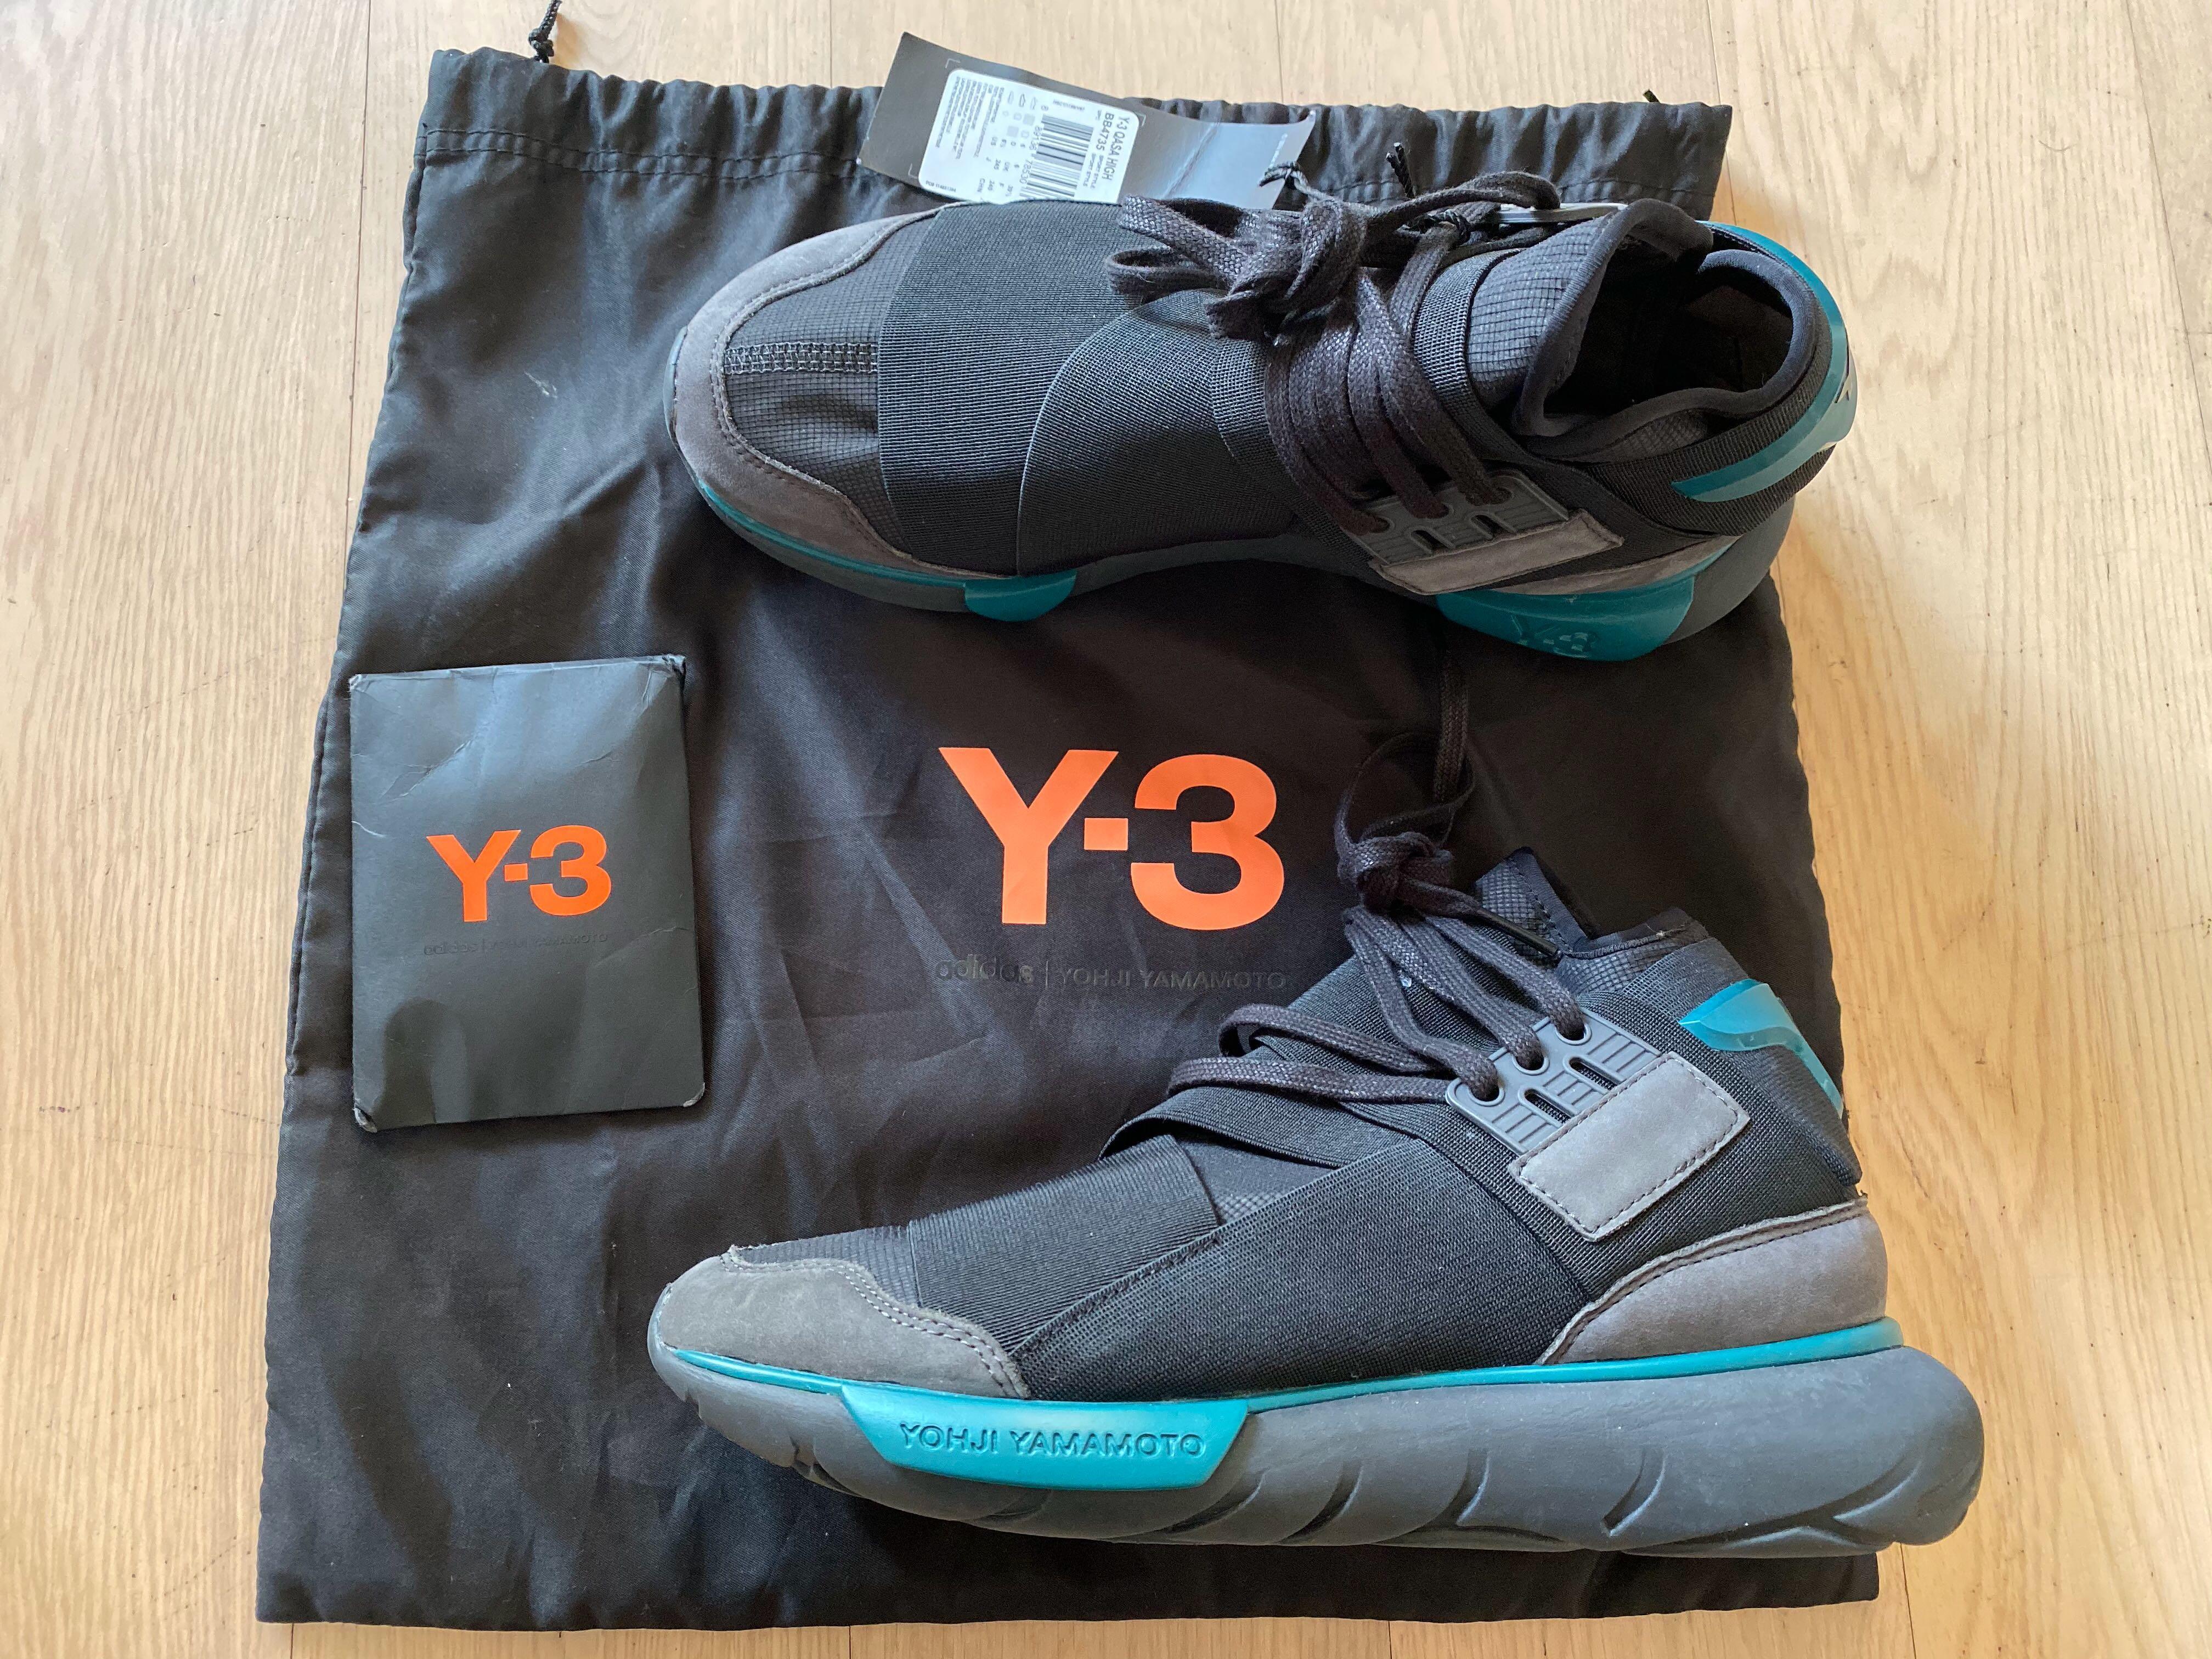 y3 qasa high 版 型